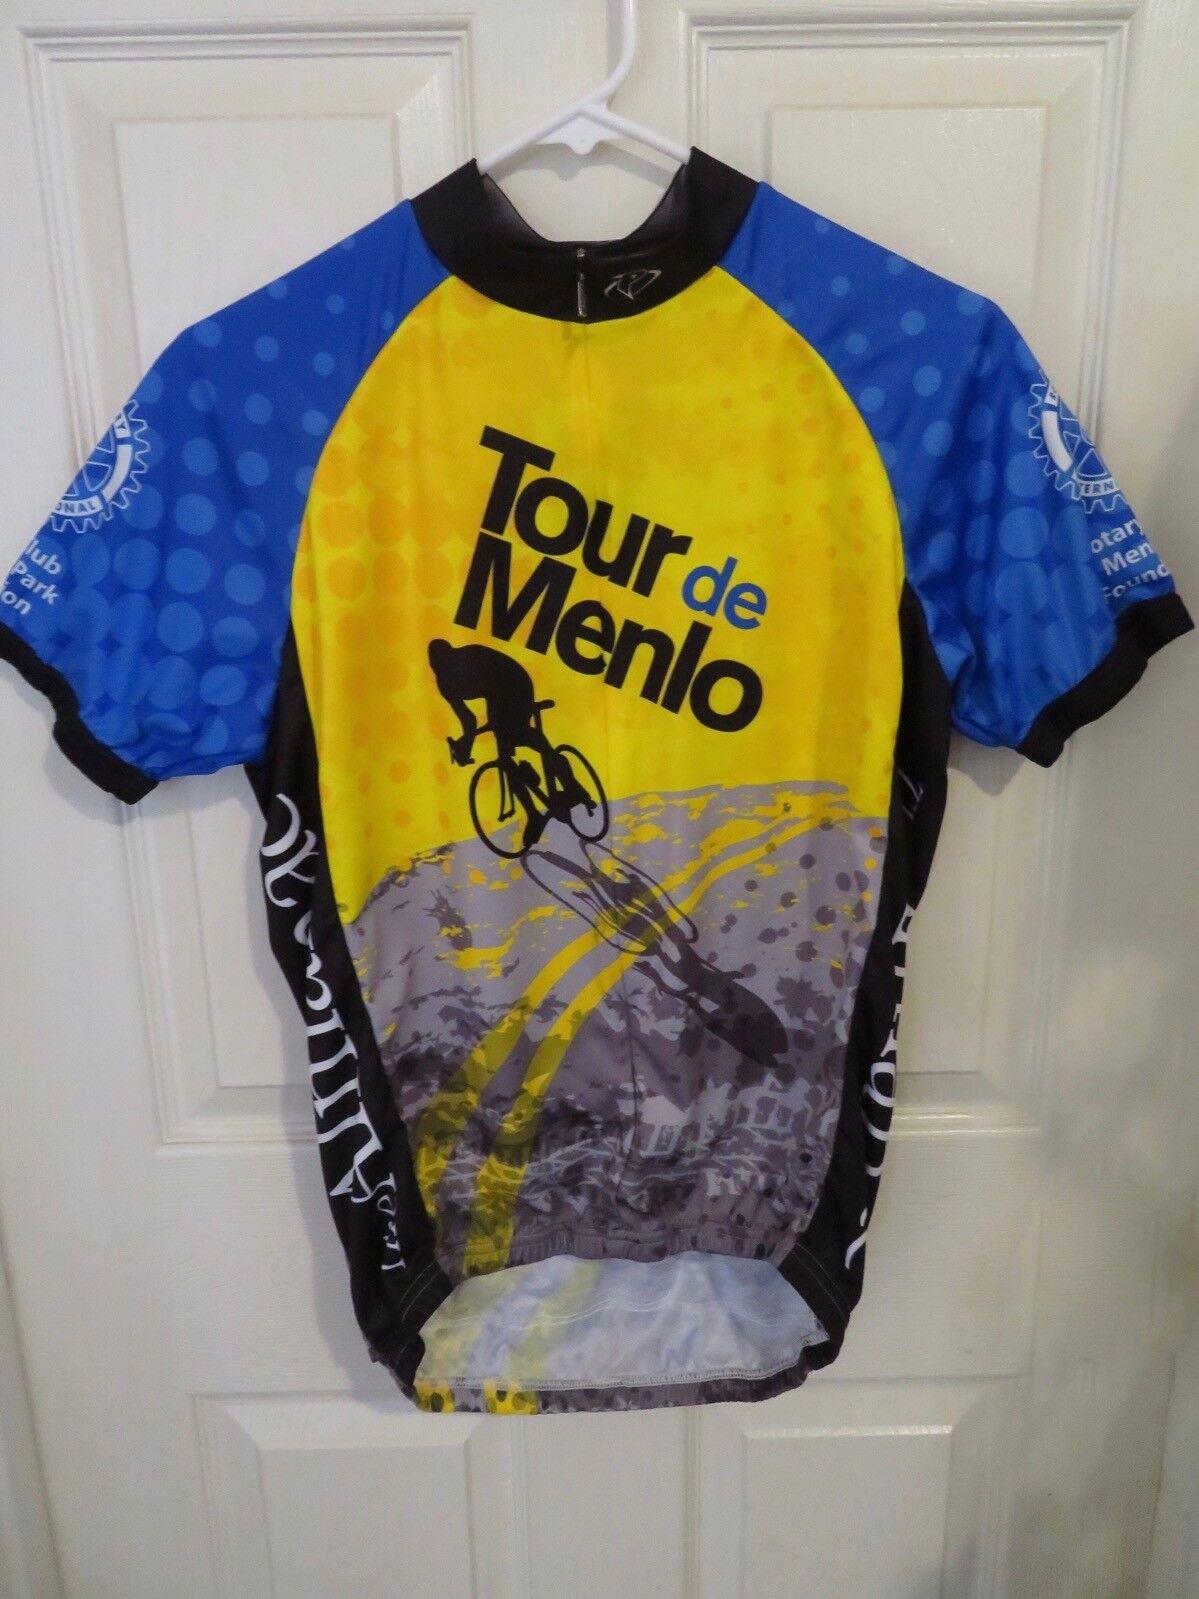 Men's Primal California Tour De Menlo Cycling Jersey bluee & Yellow Size Medium